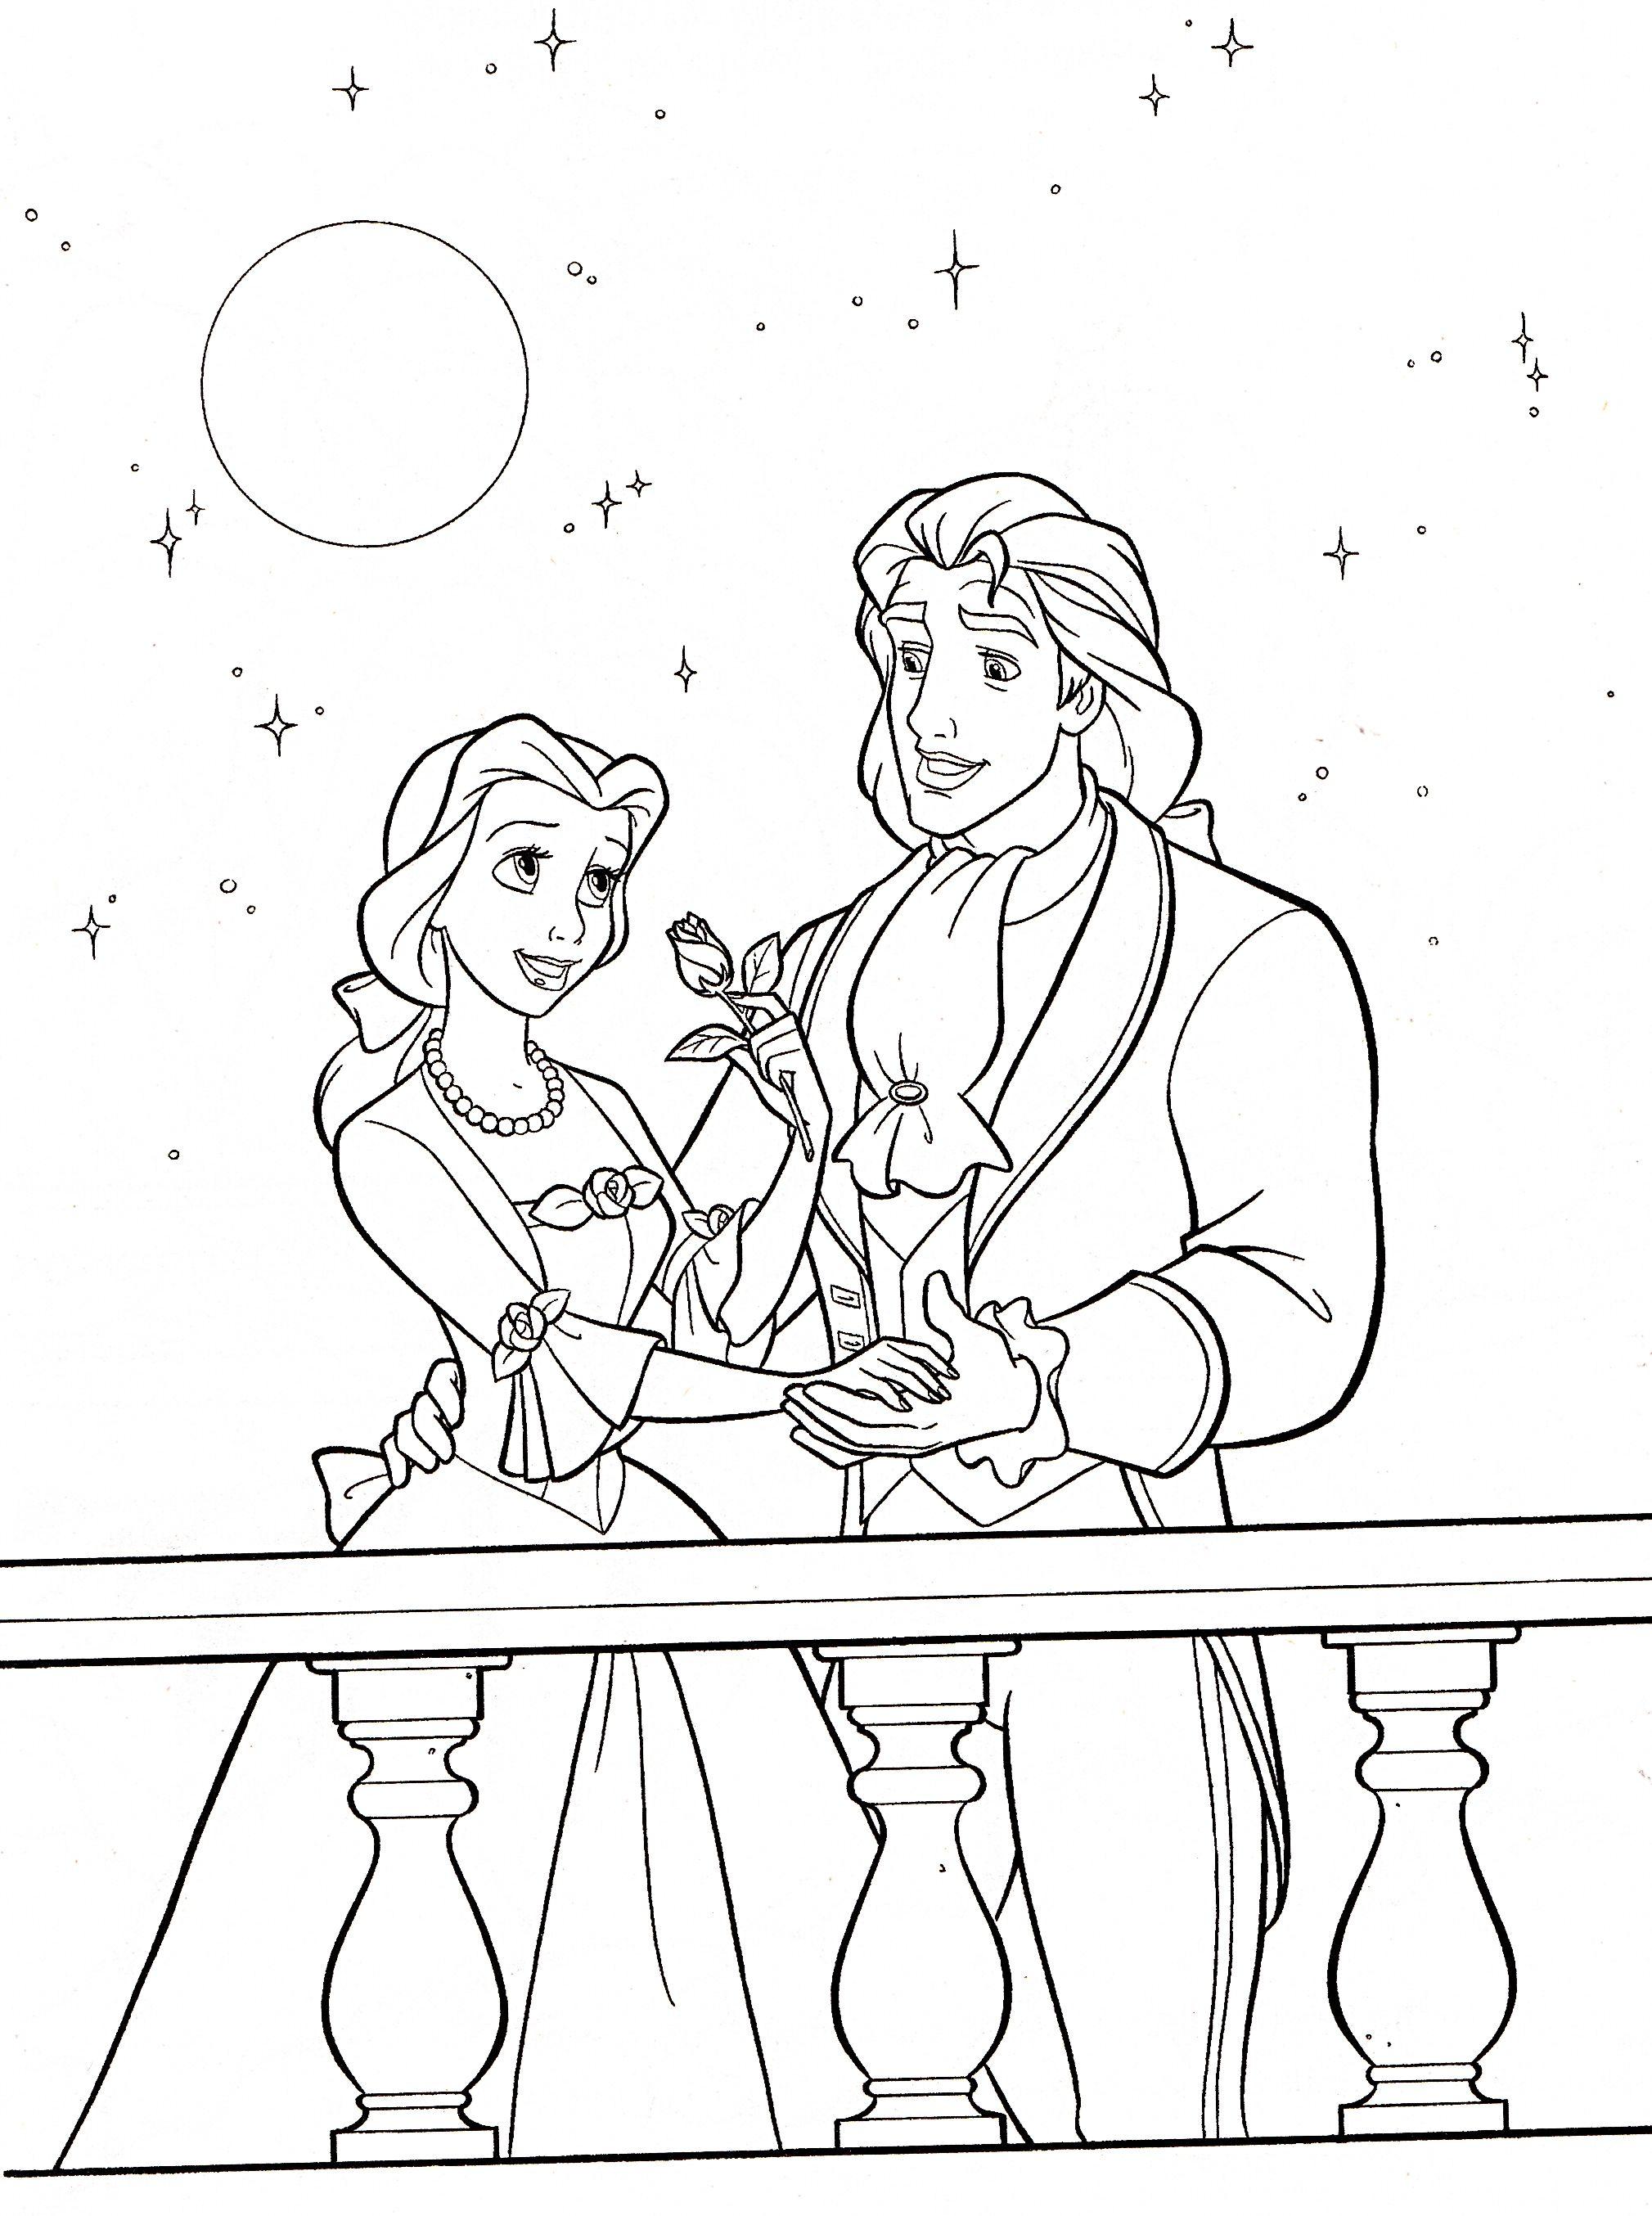 Walt Disney Coloring Pages - Princess Belle & Prince Adam - Walt ...